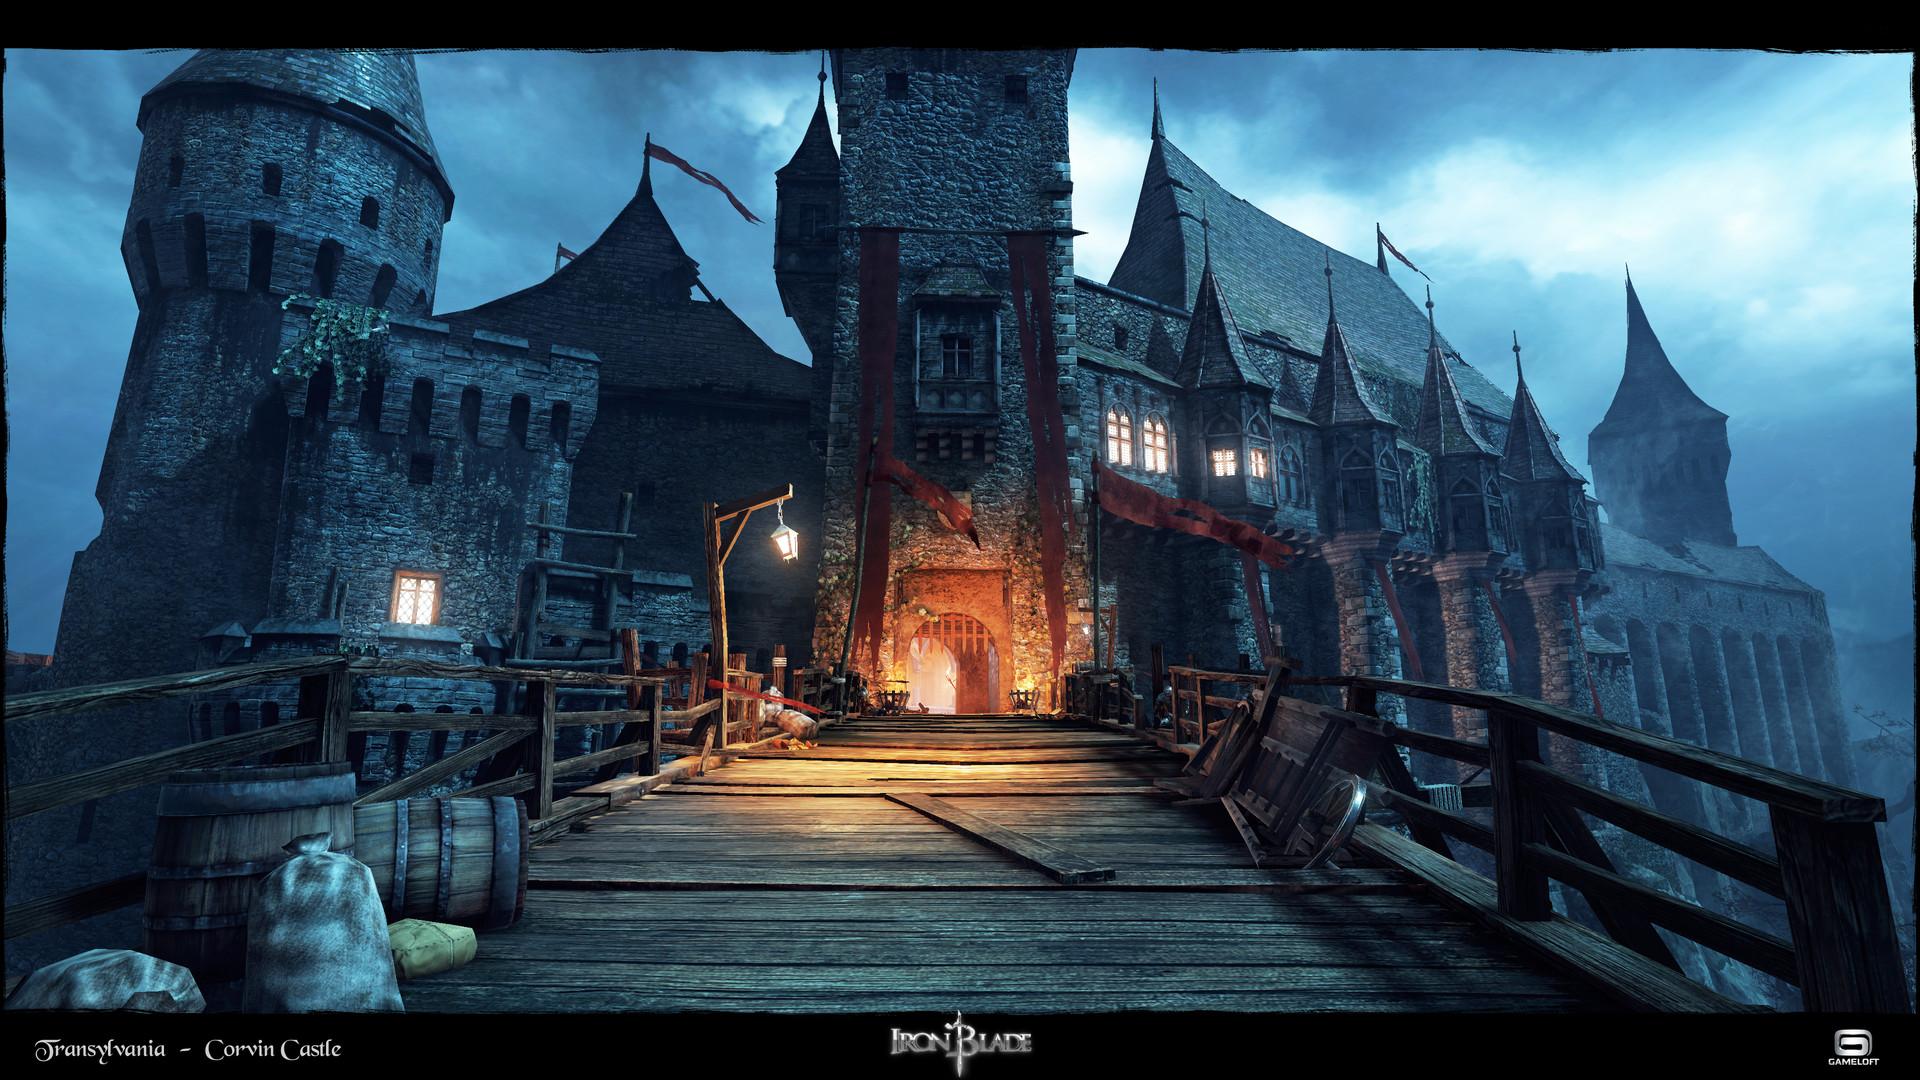 paul turc - iron blade - transylvania corvin castle